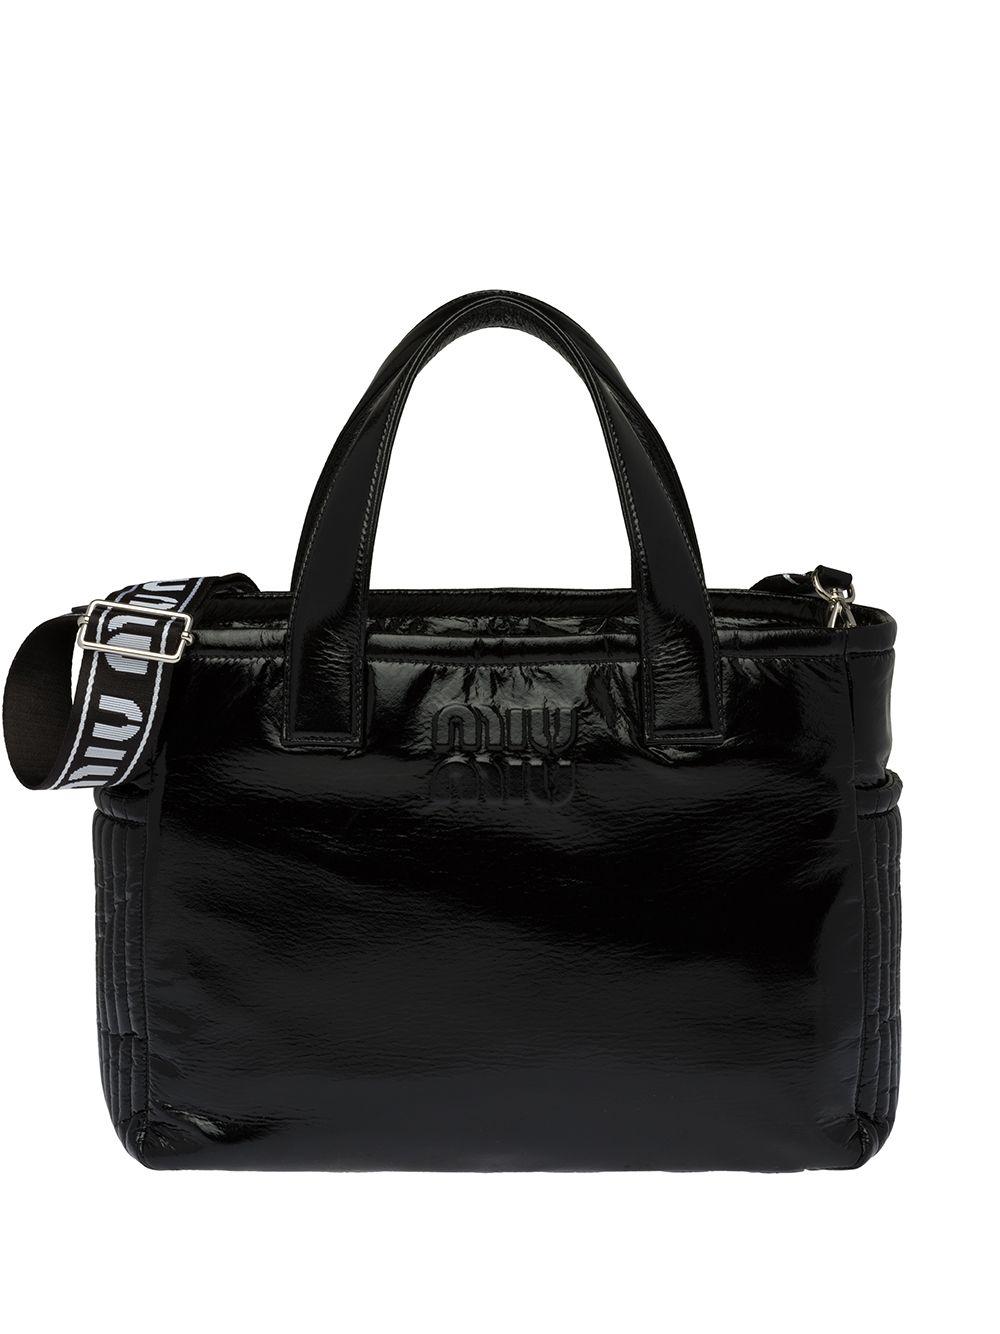 Miu Miu Ciré Handtasche mit Logo-Riemen - Schwarz